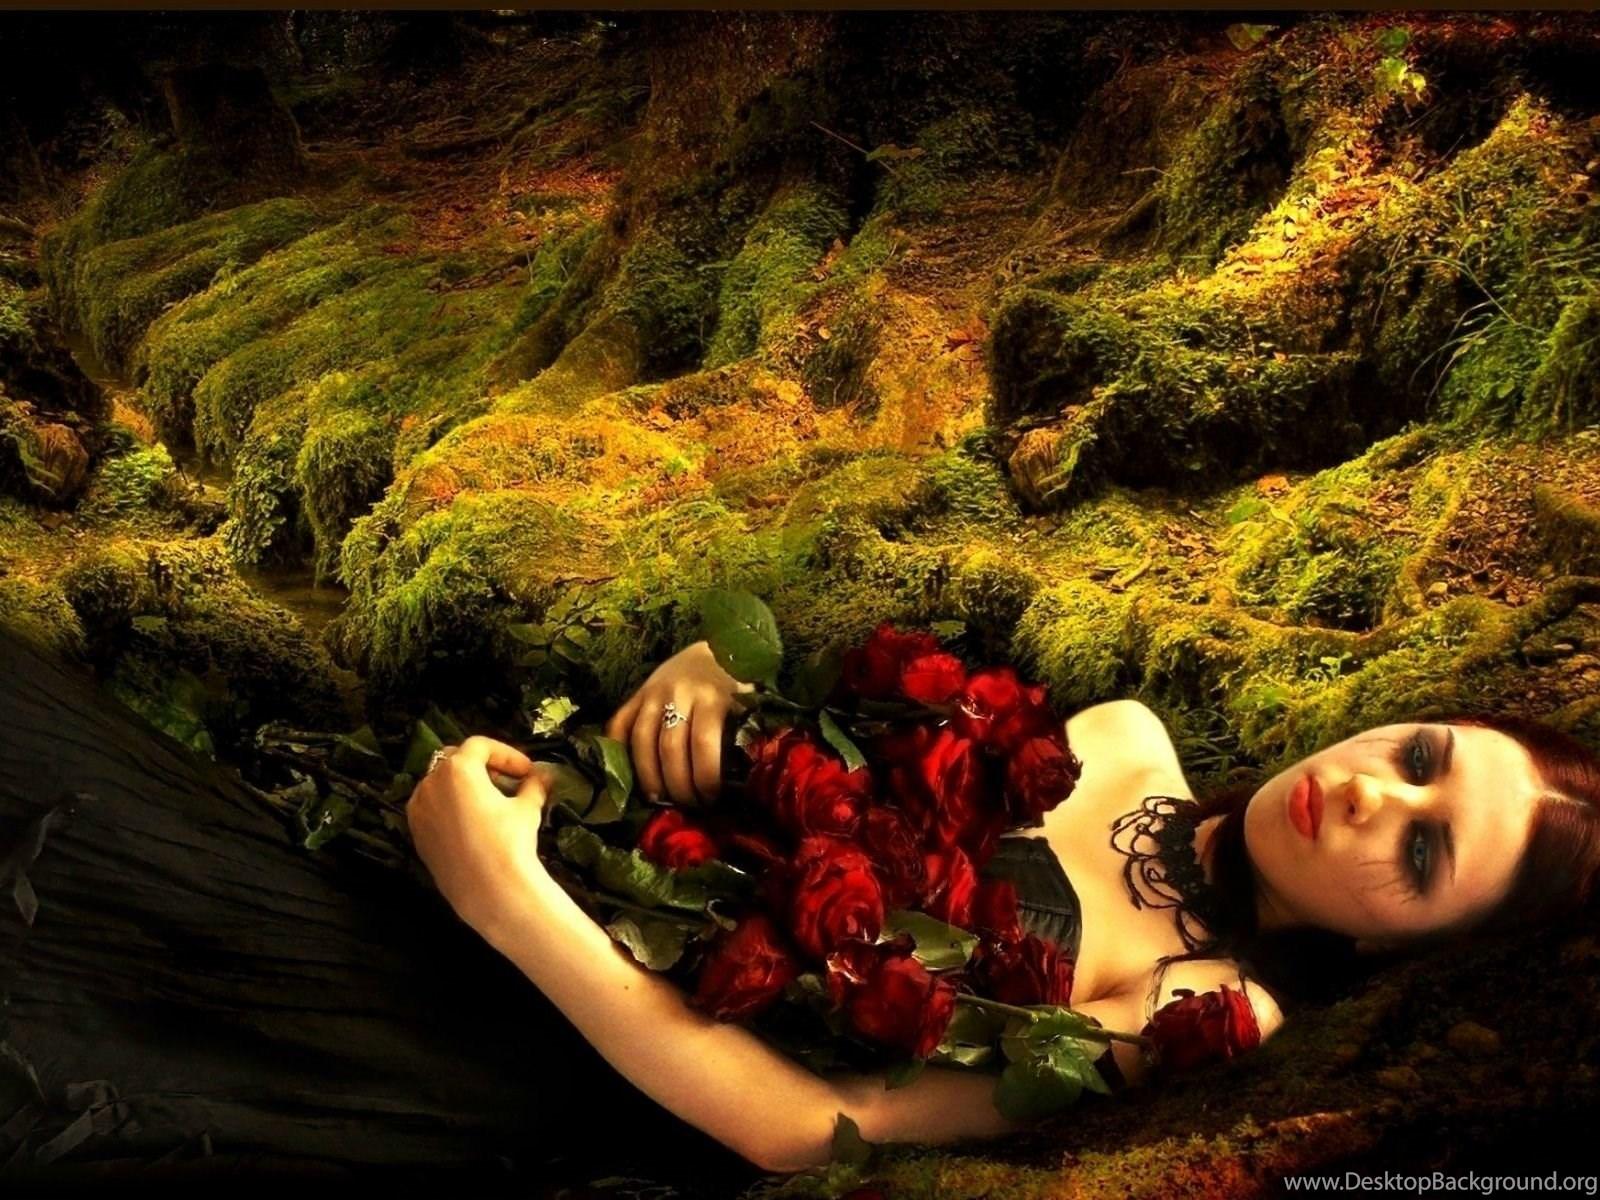 Dark Gothic Women Flowers Mood Sad Sorrow Love Romance Vampire ...